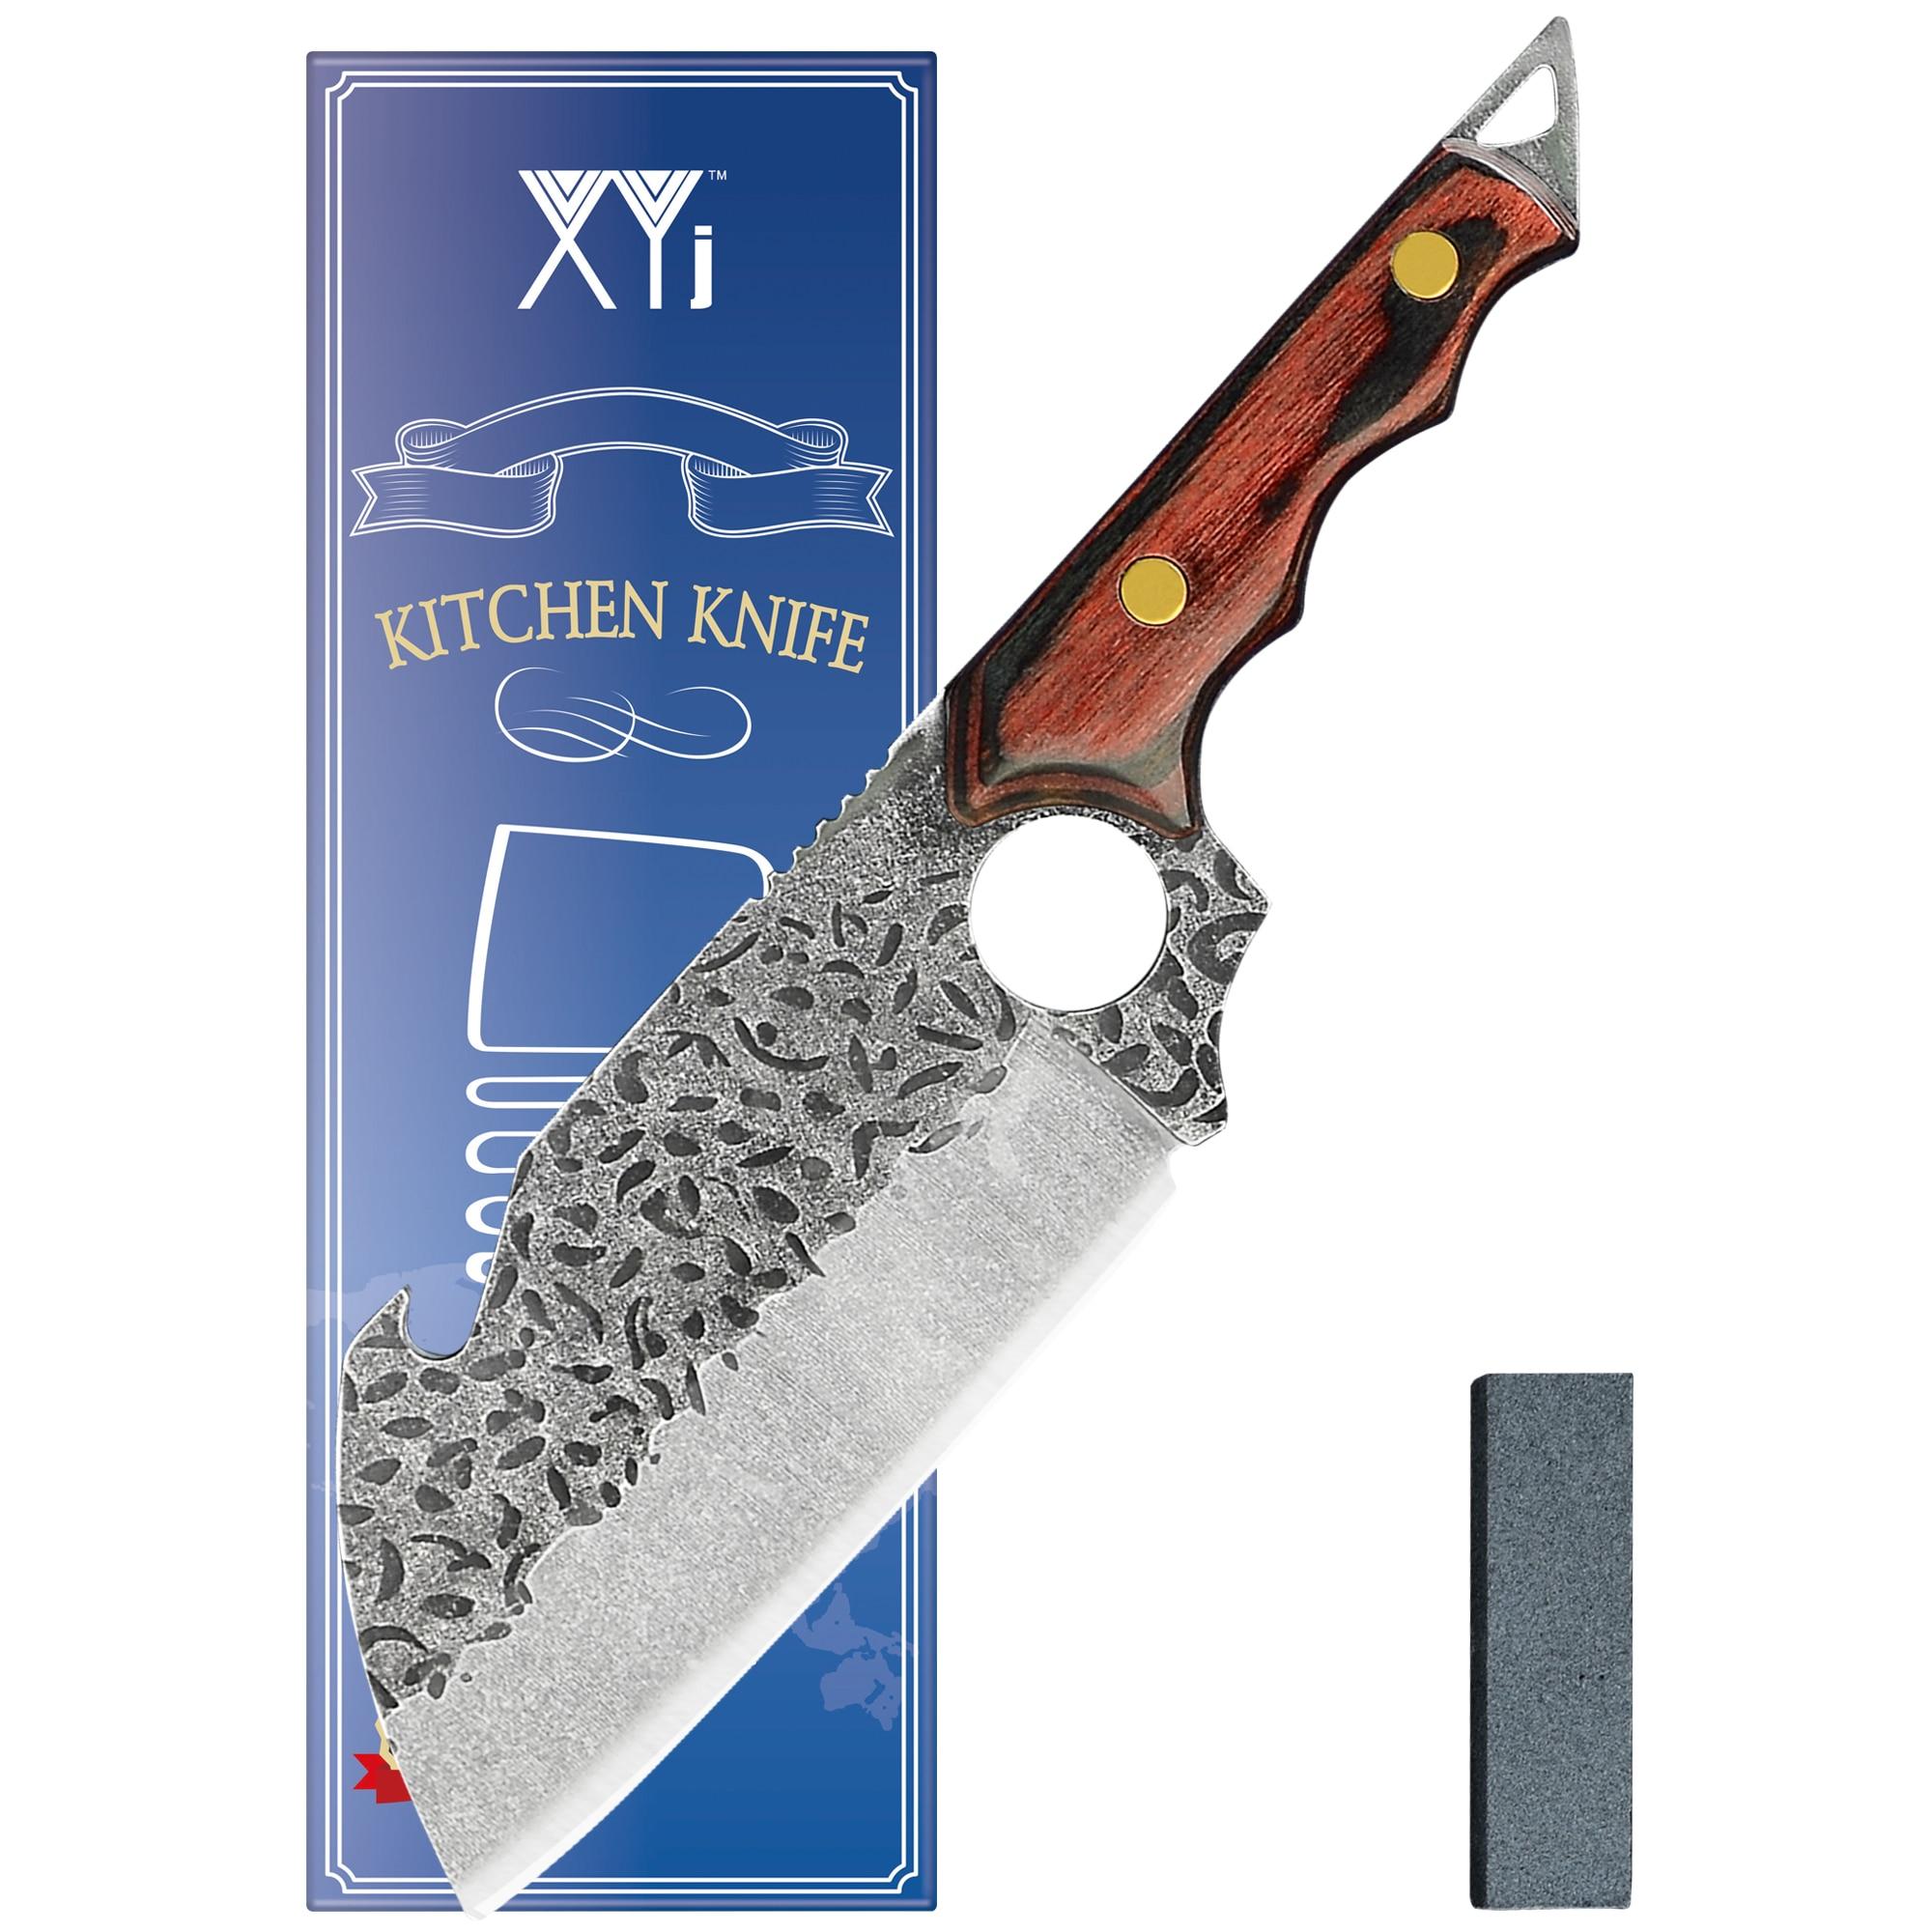 XYJ كامل تانغ 6.5 بوصة سكين صيد صغير اللحوم الساطور ذبح جزار تركيا Boning عالية الكربون الصلب السكاكين مع المشحذ